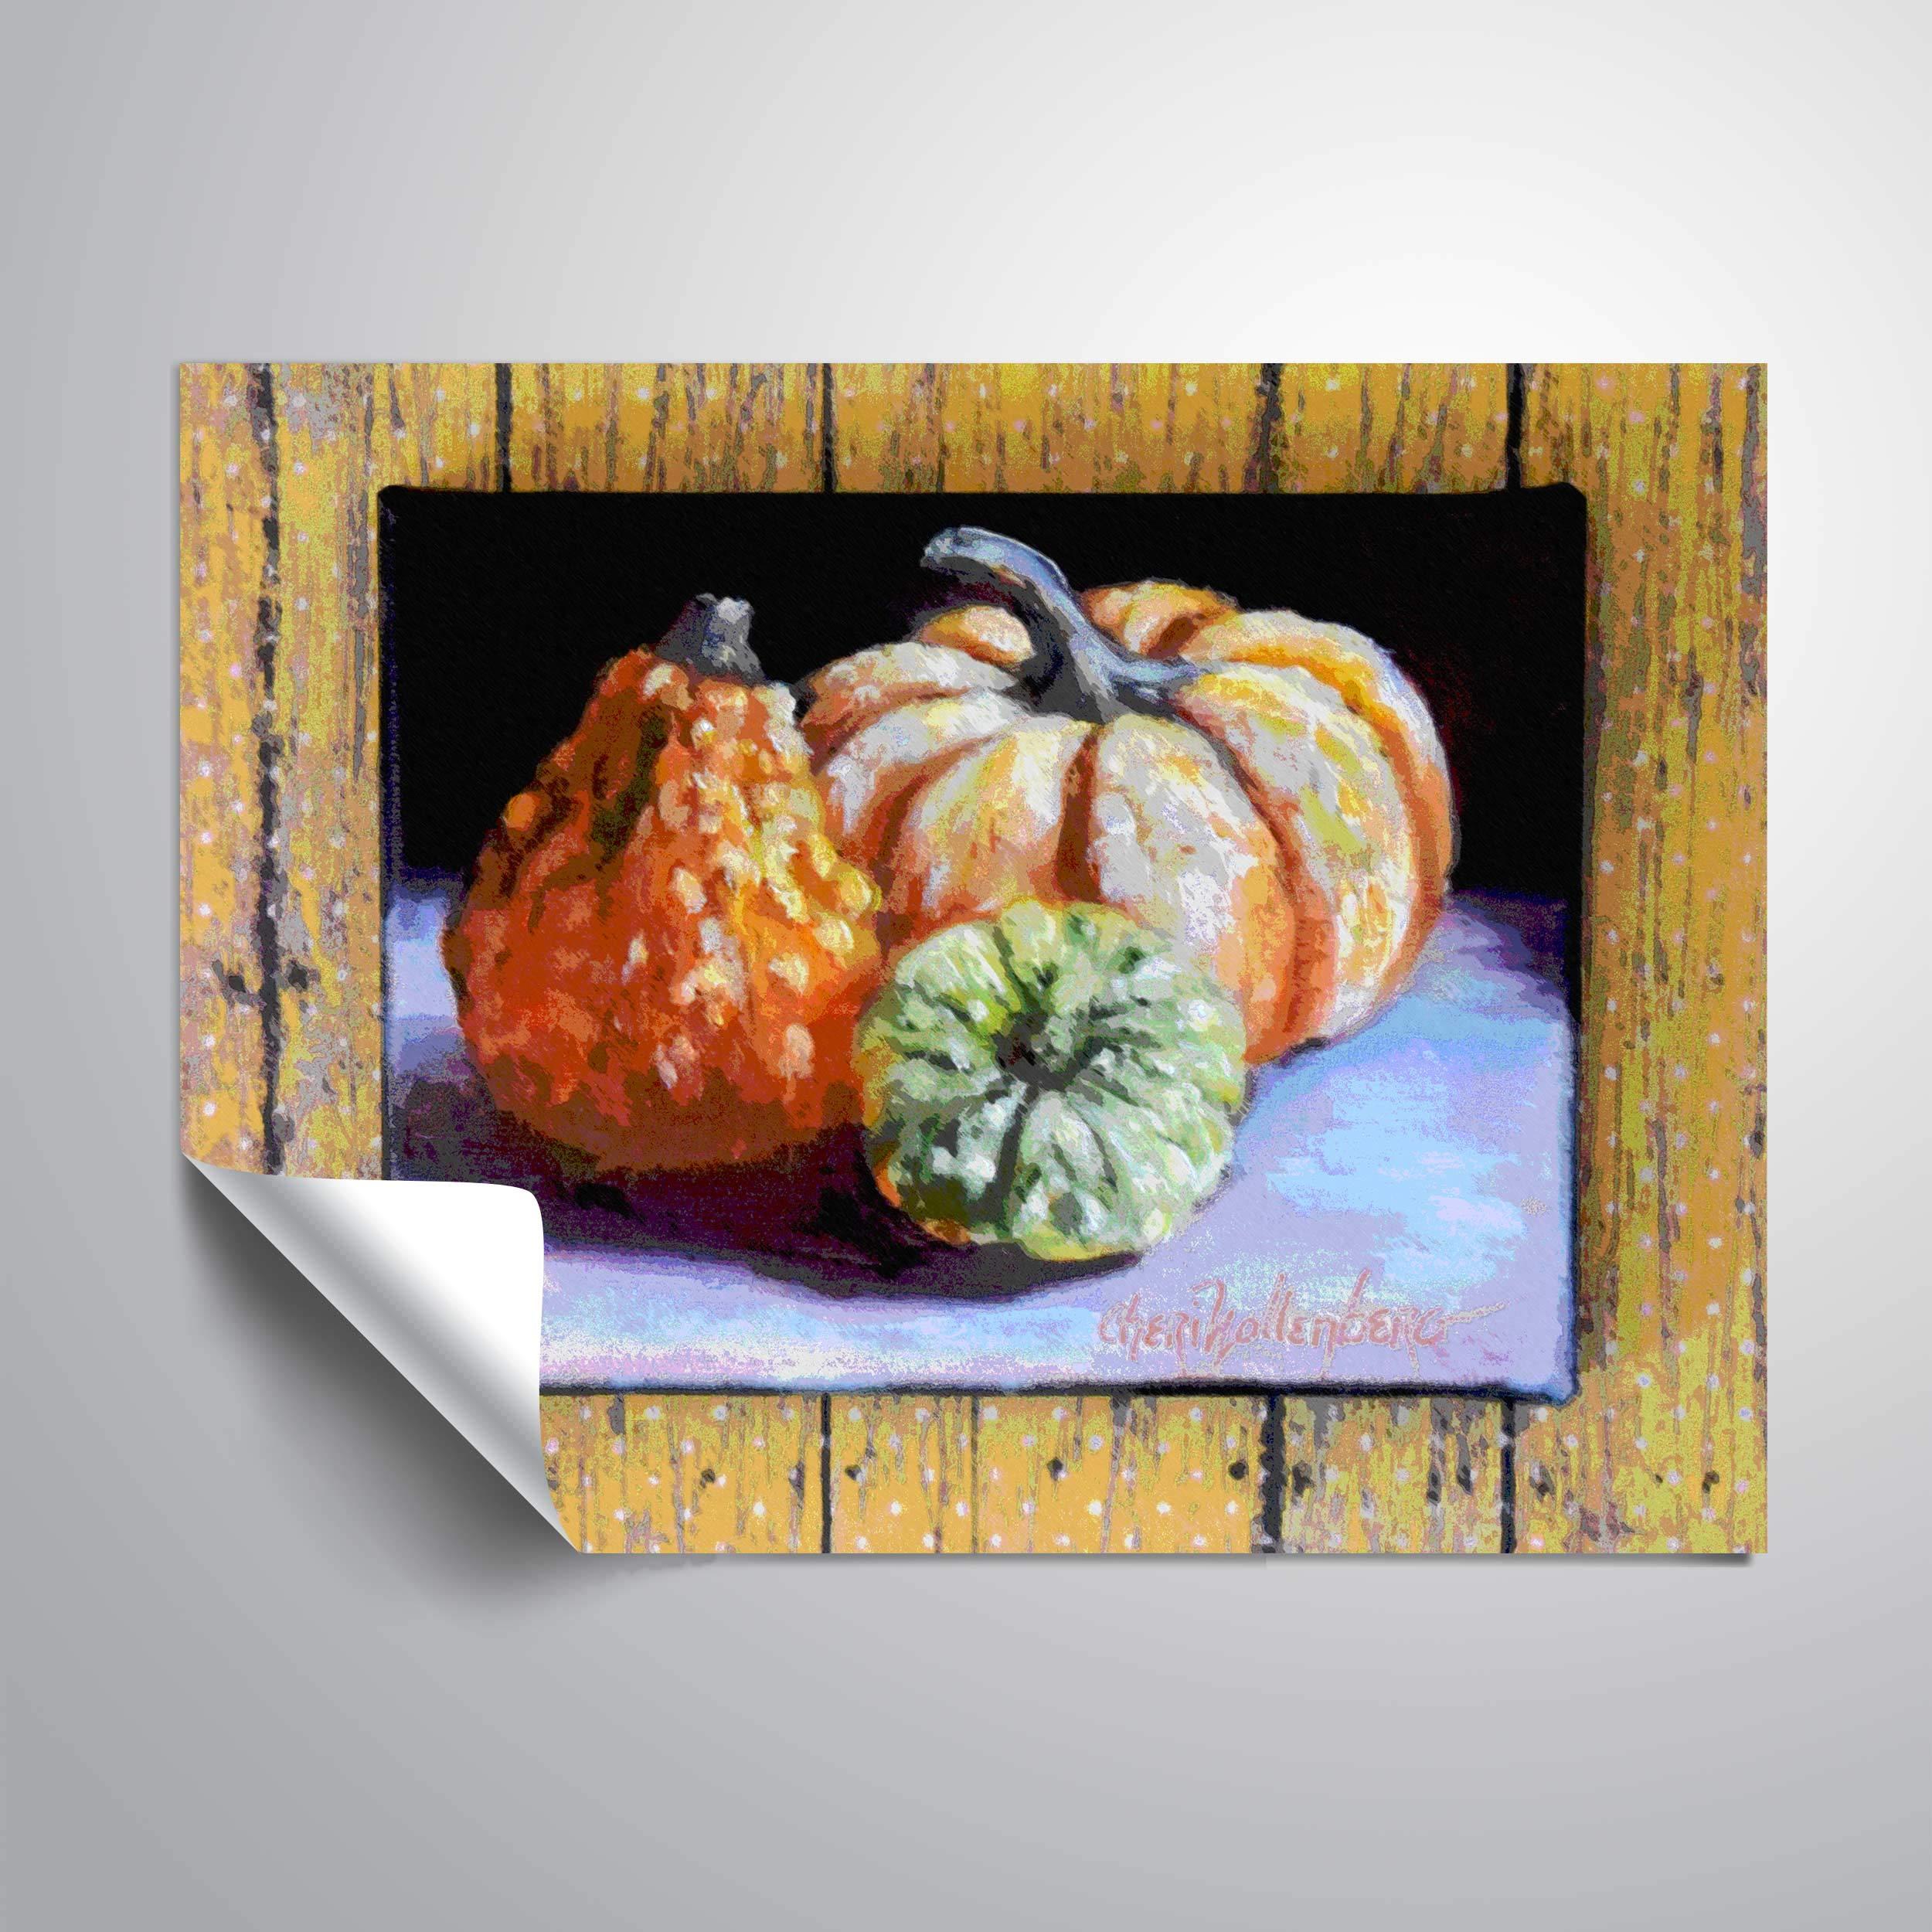 18 x 18 ArtWall Elana Rays Cyan Swirl Art Appeelz Removable Graphic Wall Art